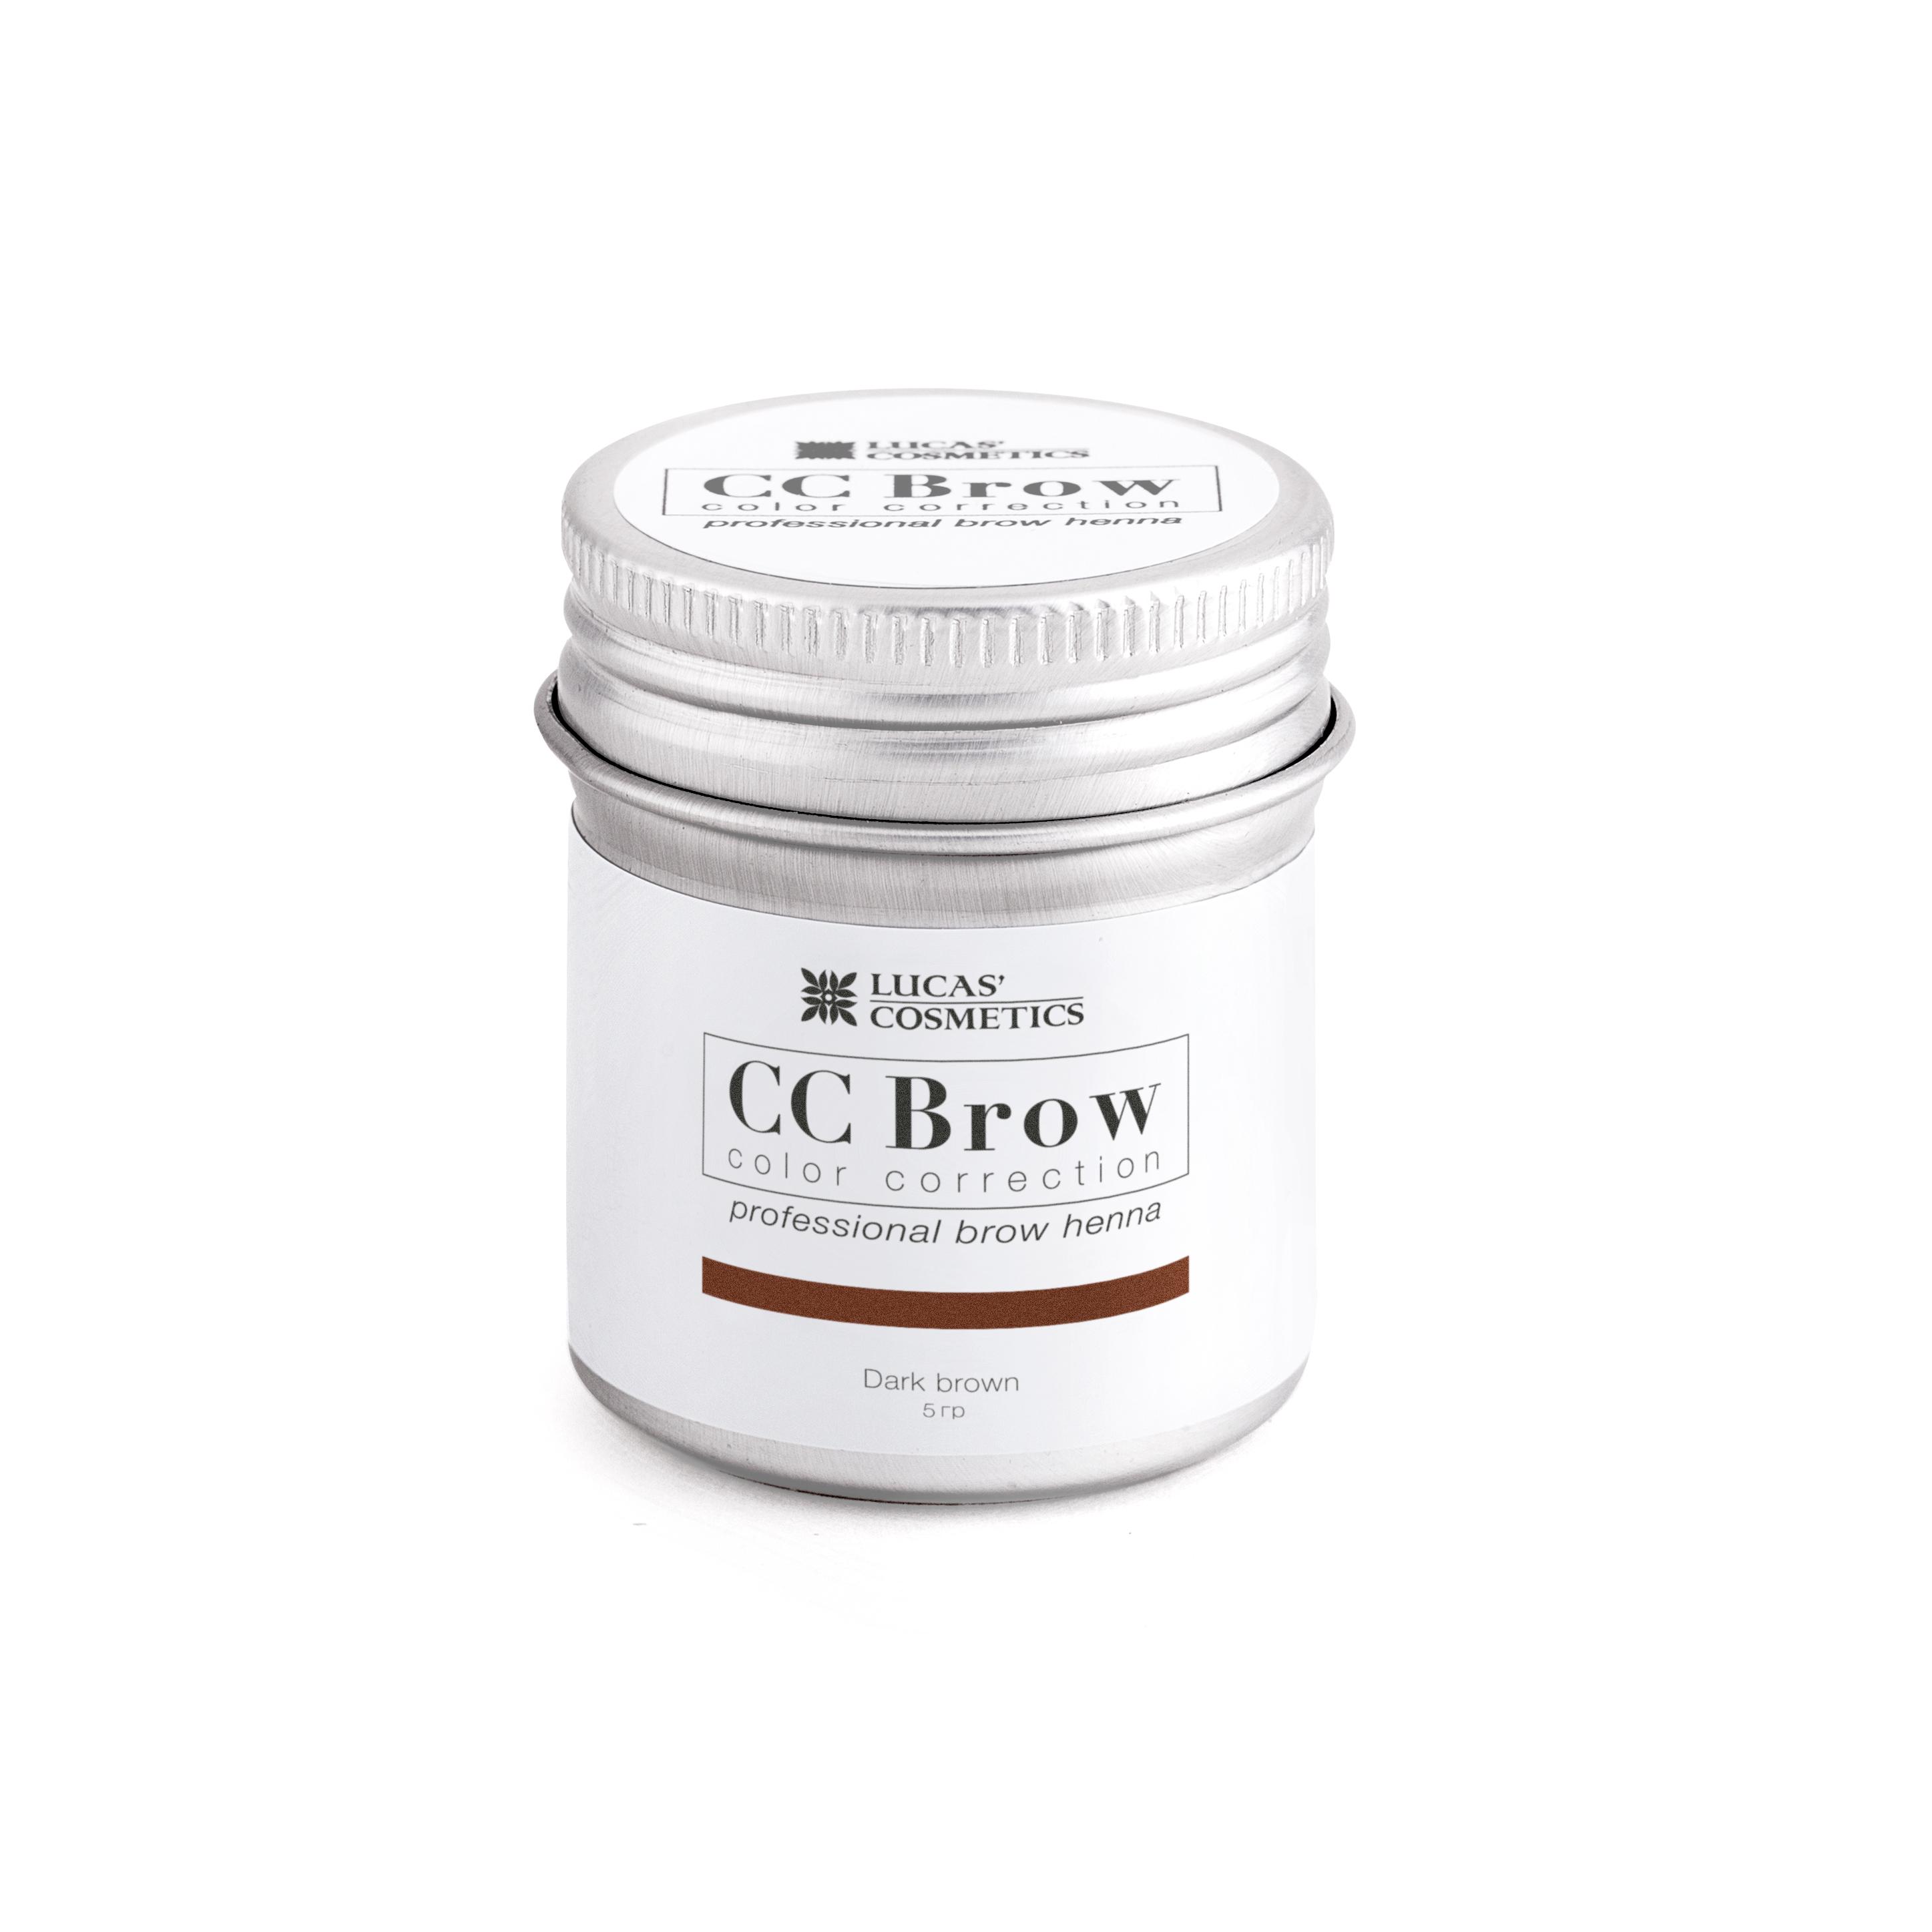 LUCAS' COSMETICS Хна для бровей в баночке (темно-коричневый) / CC Brow (dark brown), 5 гр